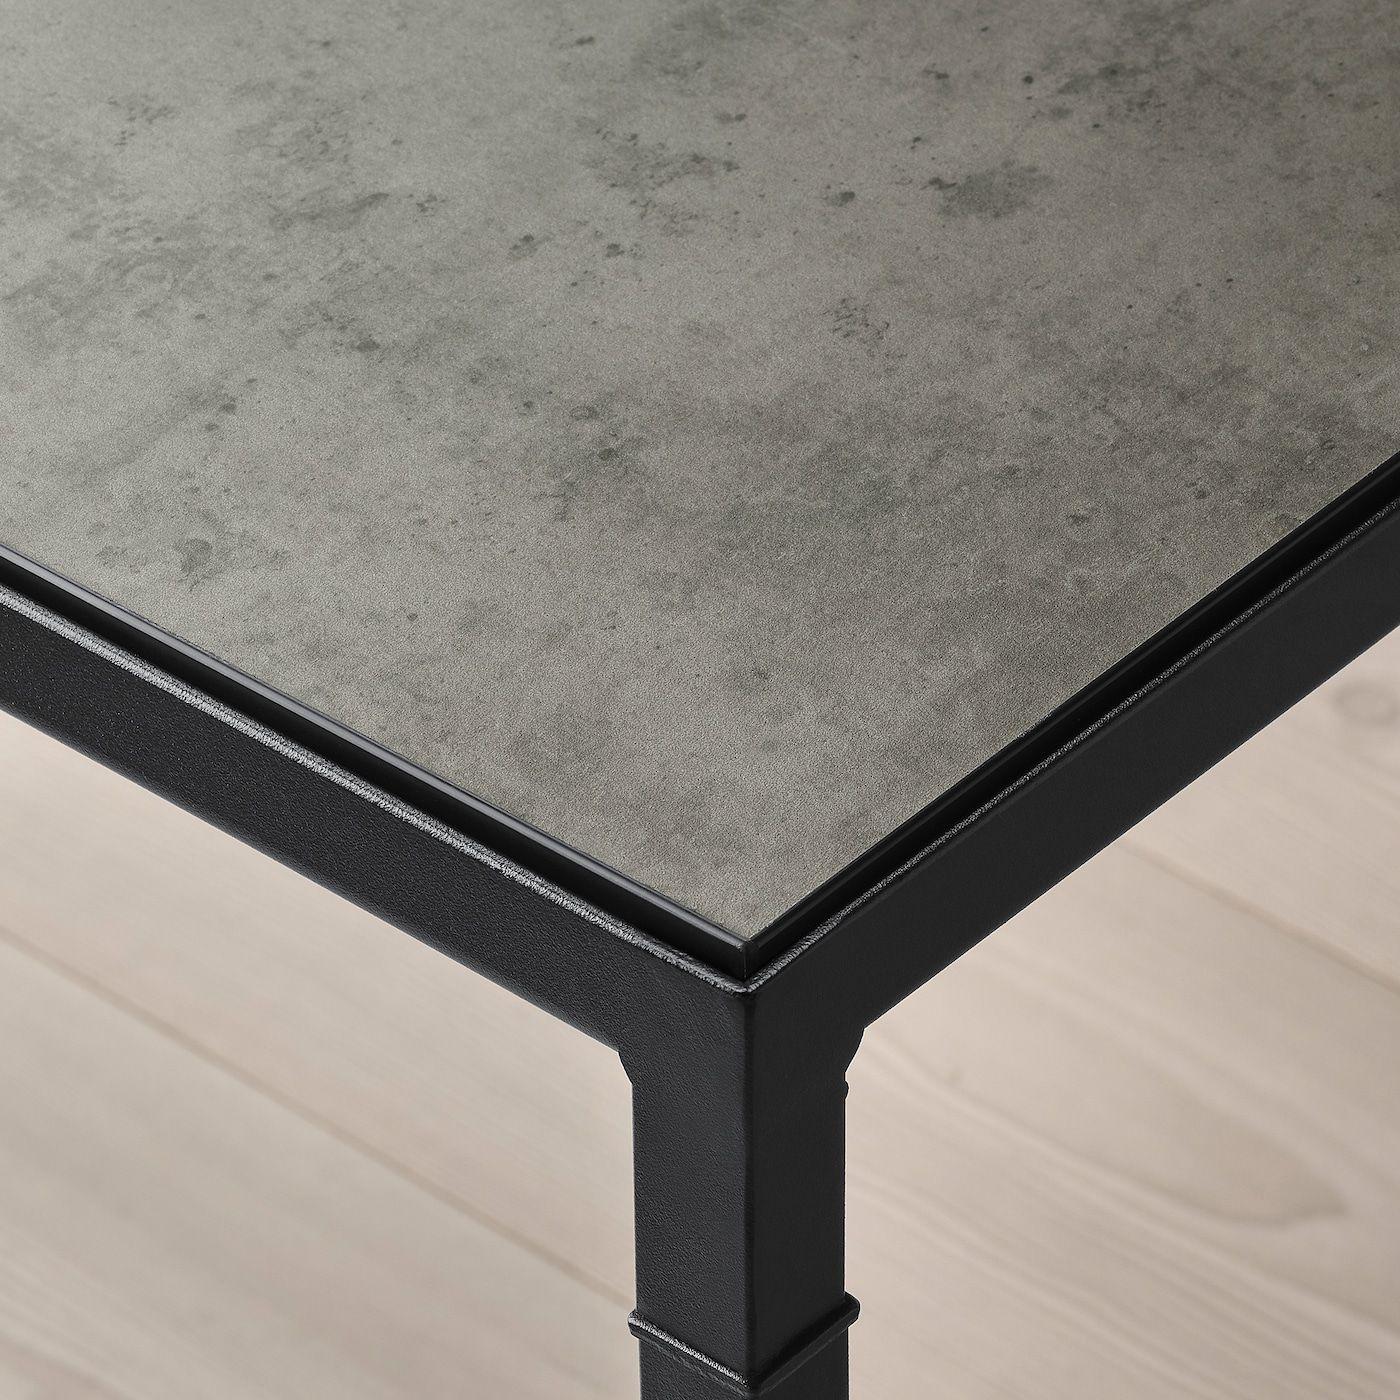 Nyboda Couchtisch Wendbare Platte Dunkelgrau Betonmuster Schwarz 75x60x50 Cm Ikea Osterreich In 2021 Black Coffee Tables Table Top Coffee Table [ 1400 x 1400 Pixel ]